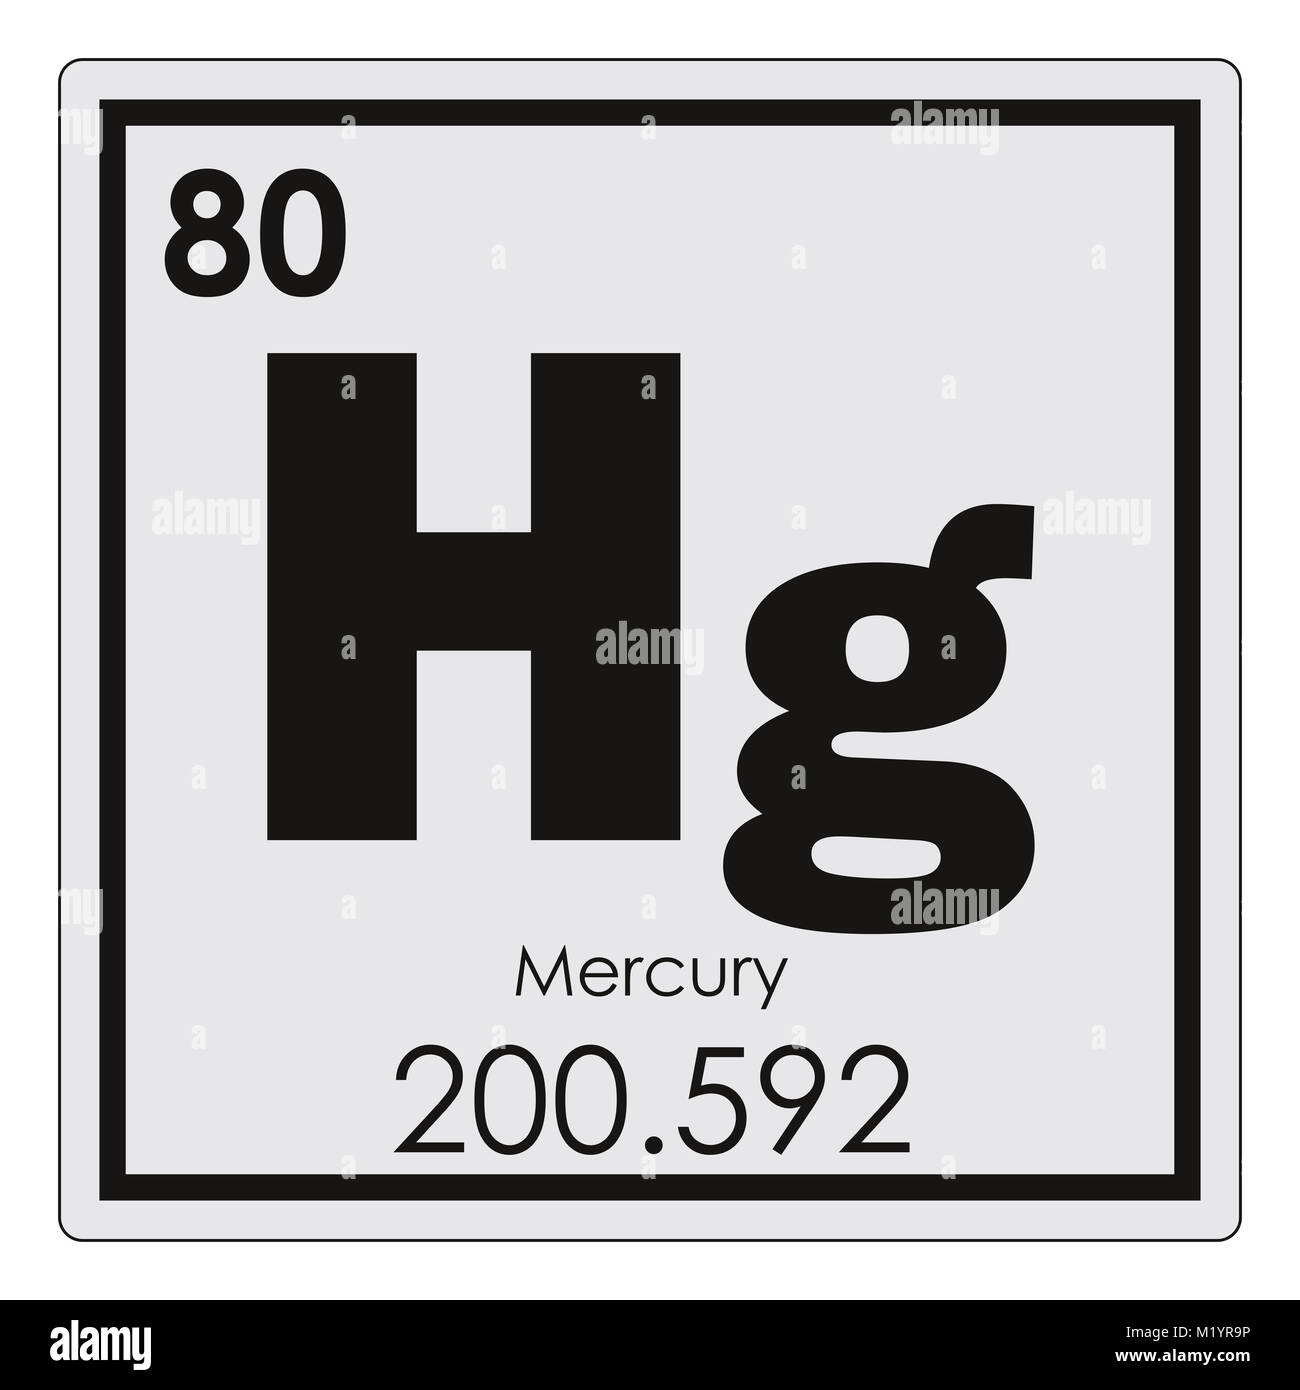 Tabla peridica de elementos qumicos mercurio smbolo de ciencia tabla peridica de elementos qumicos mercurio smbolo de ciencia urtaz Gallery